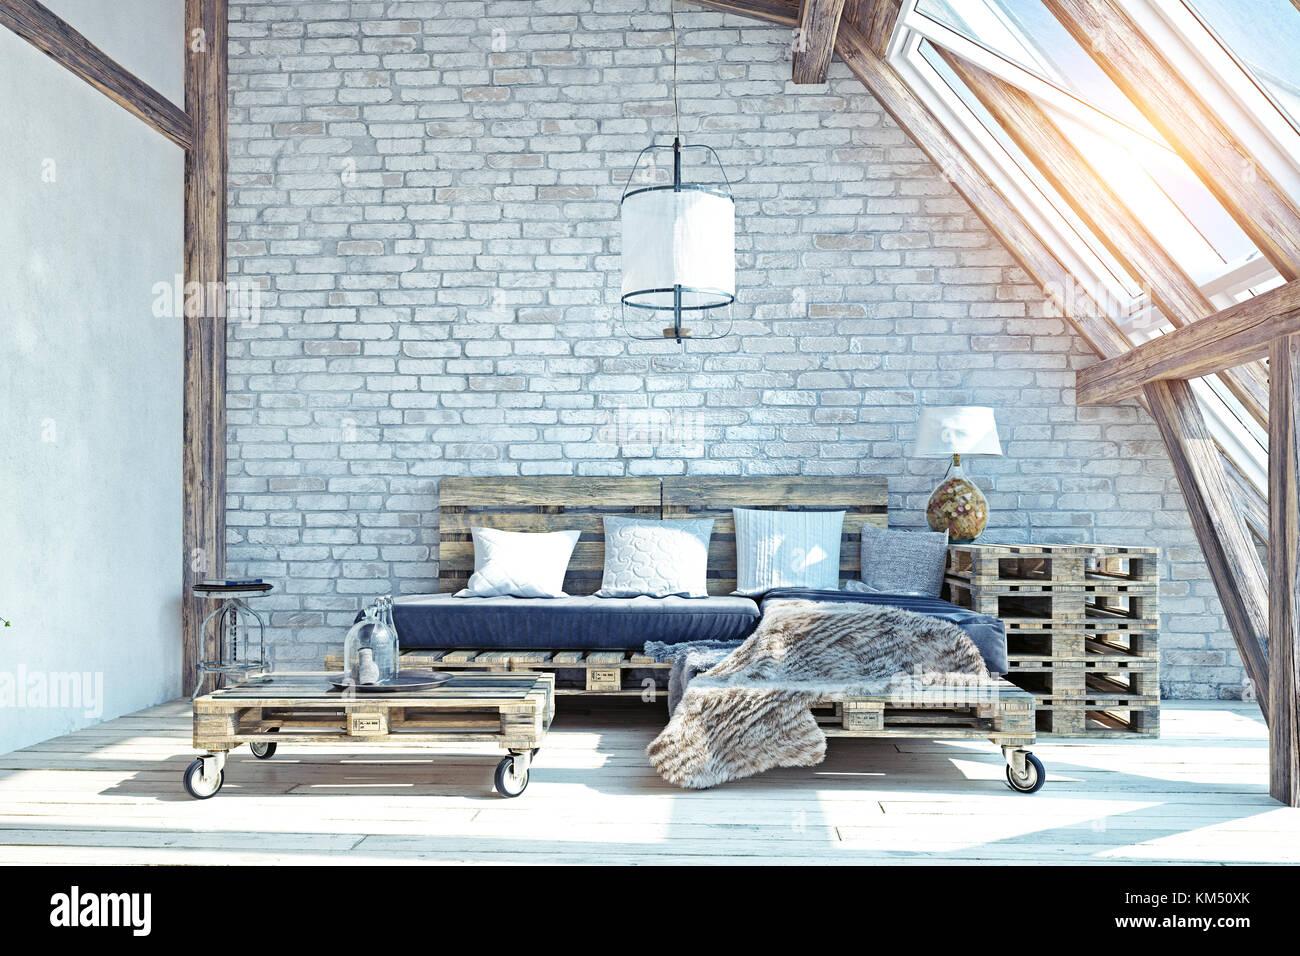 Buhardilla Sal N Interior Muebles De Palets 3d Ilustraci N Foto  # Muebles Buardilla